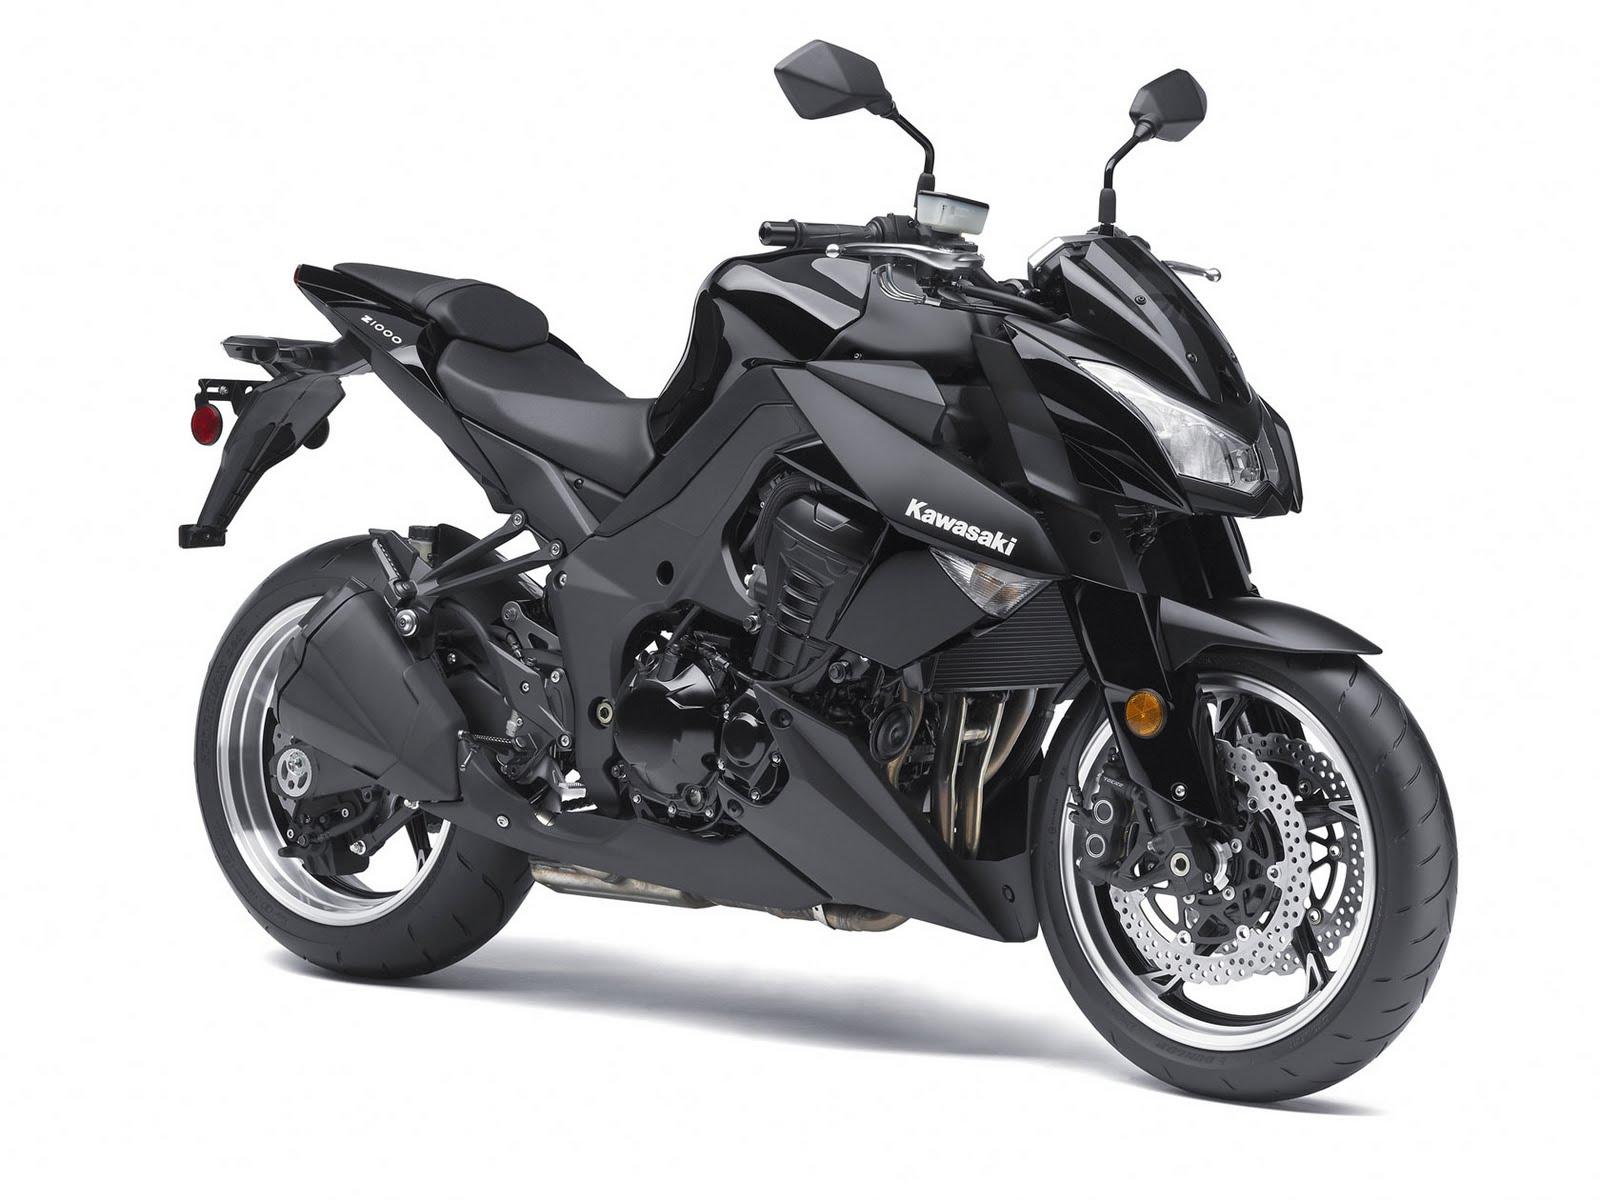 Watch furthermore Bikes And Motorcycle Hd Wallpapers likewise Kawasaki Ninja 636 Zx6 R Ninja Graphics 2013 2014 further Kawasaki Ninja Zx 14 Wallpapers moreover Kawasaki Gtr 1400 2009. on custom kawasaki ninja zx 14